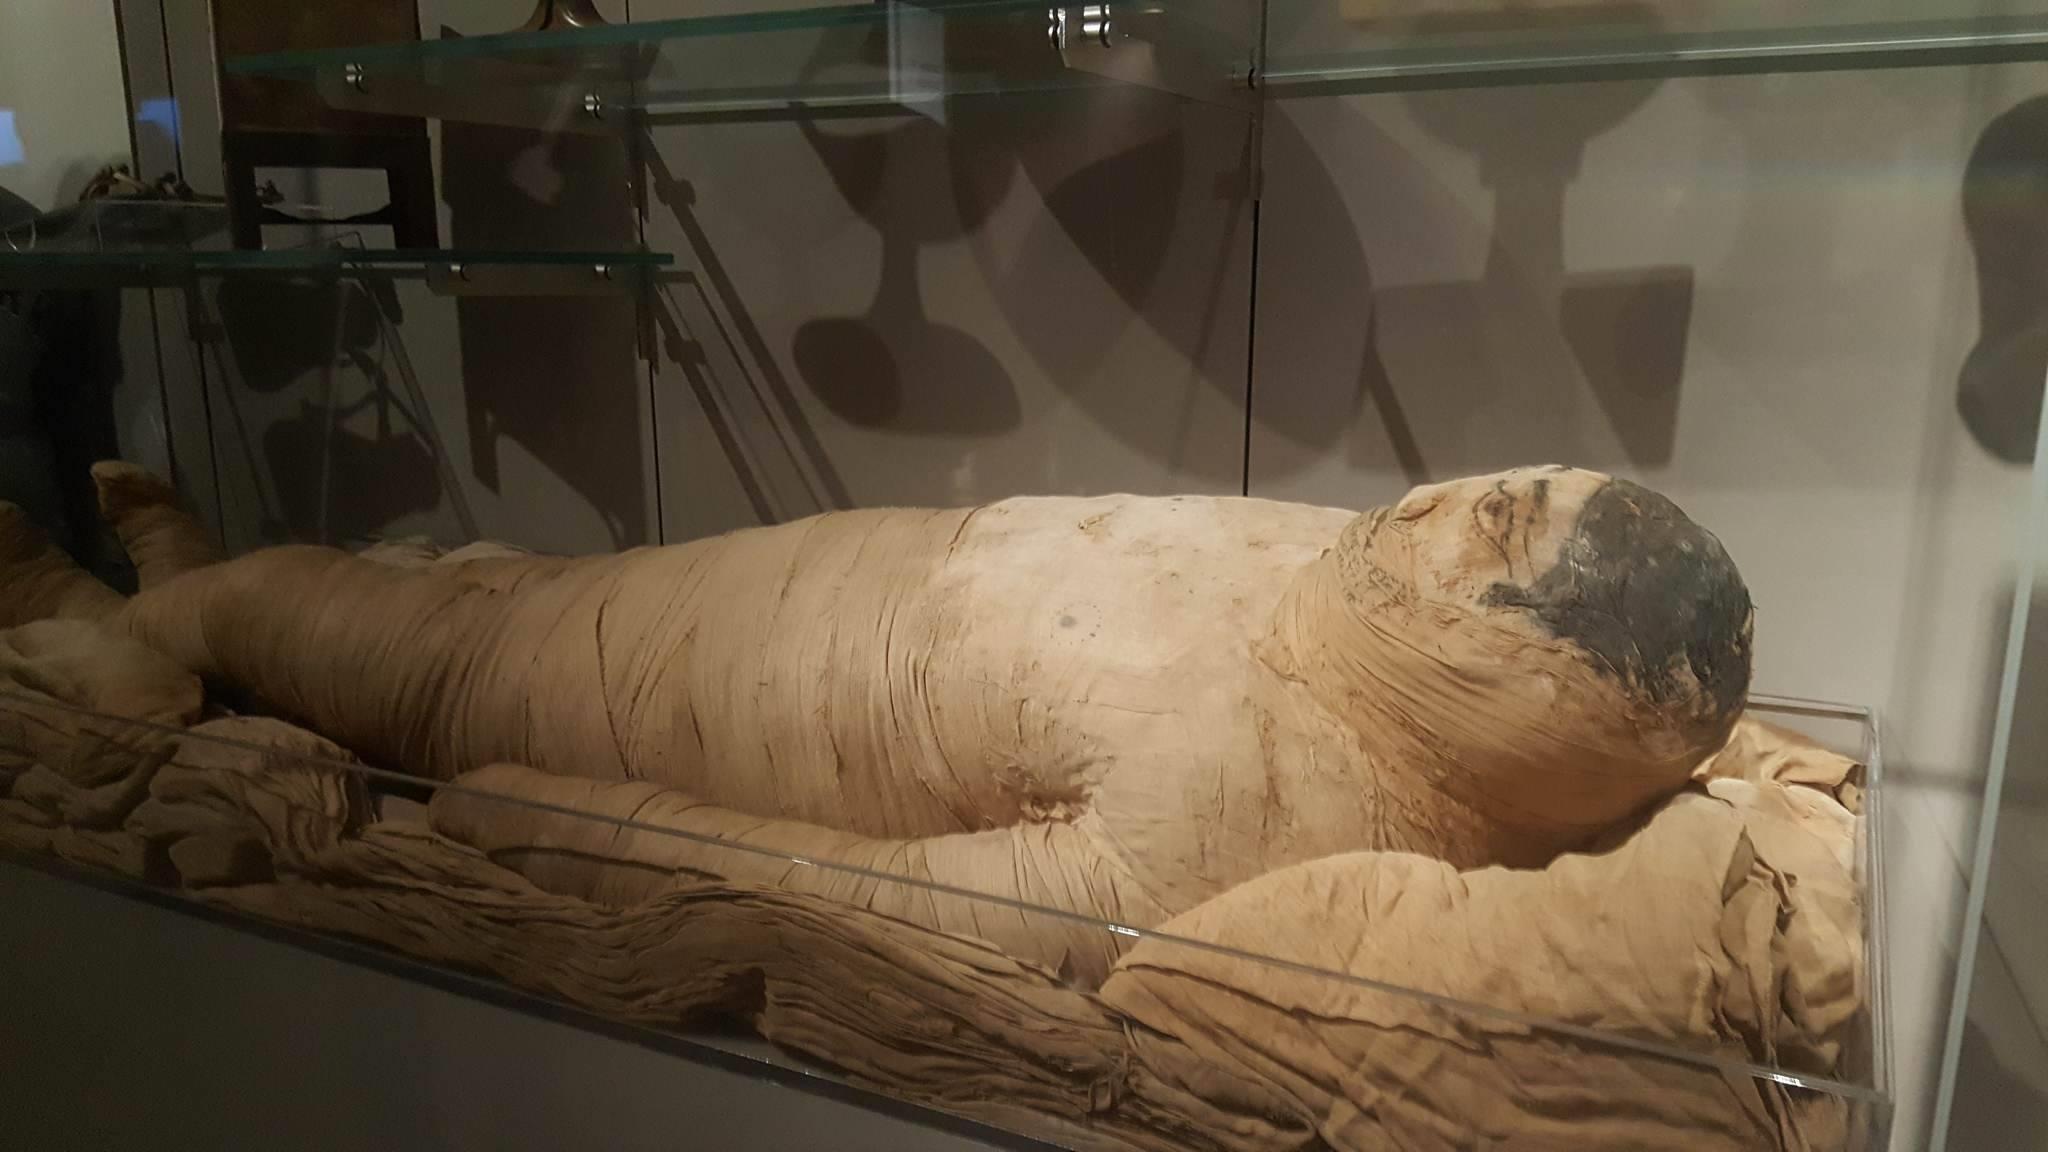 Mummy in Museo Egizio in Turin